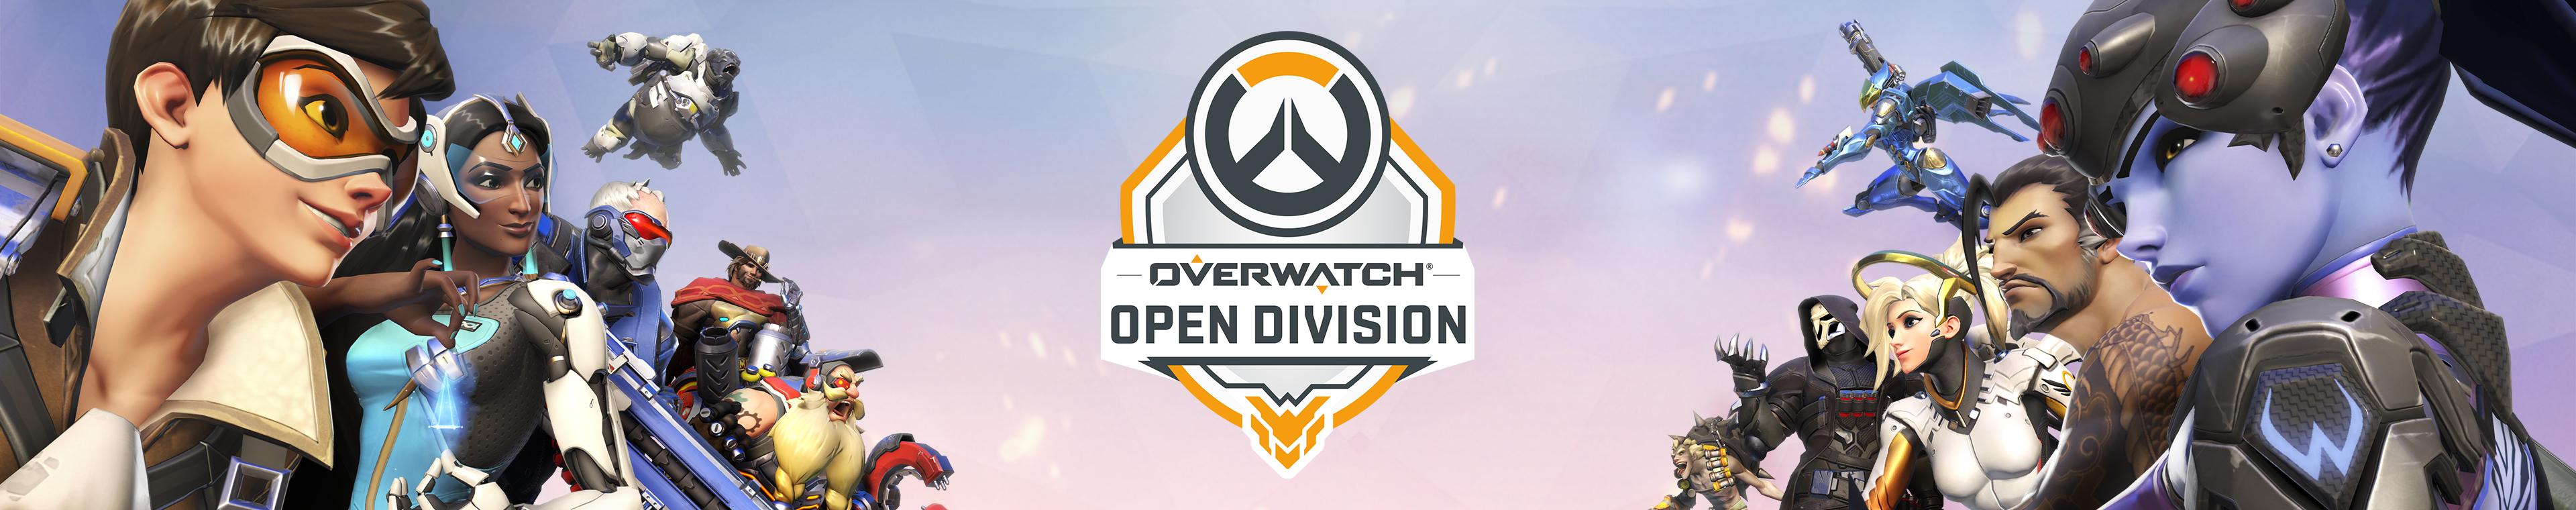 OW Open Division: Season 3